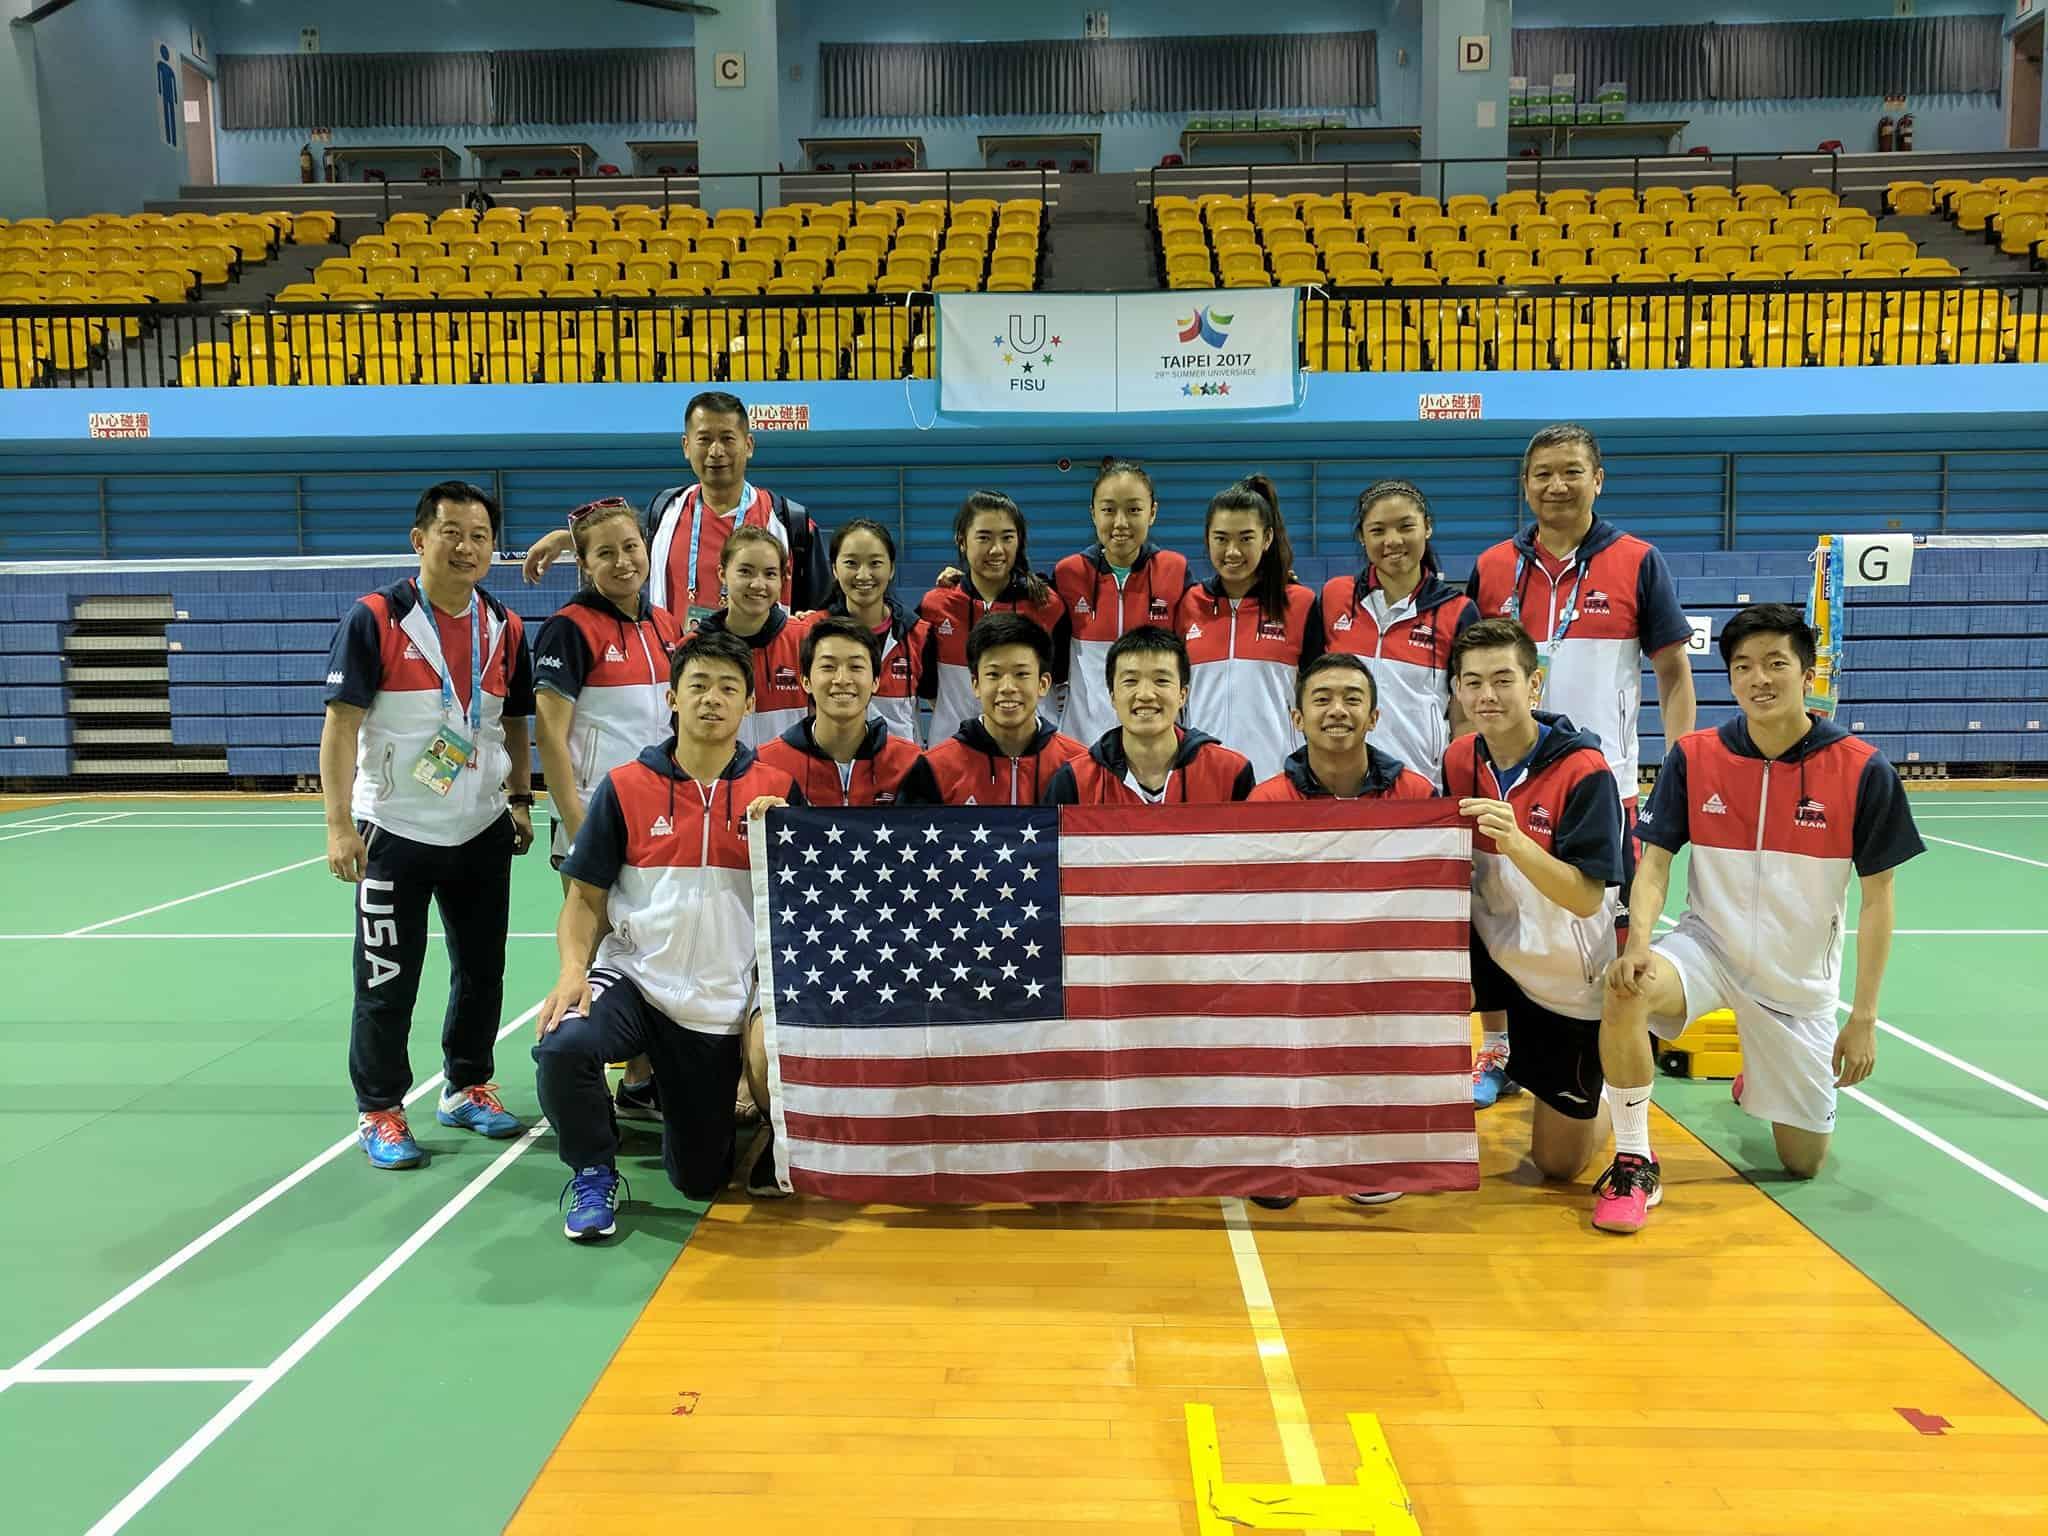 Badminton team with flag